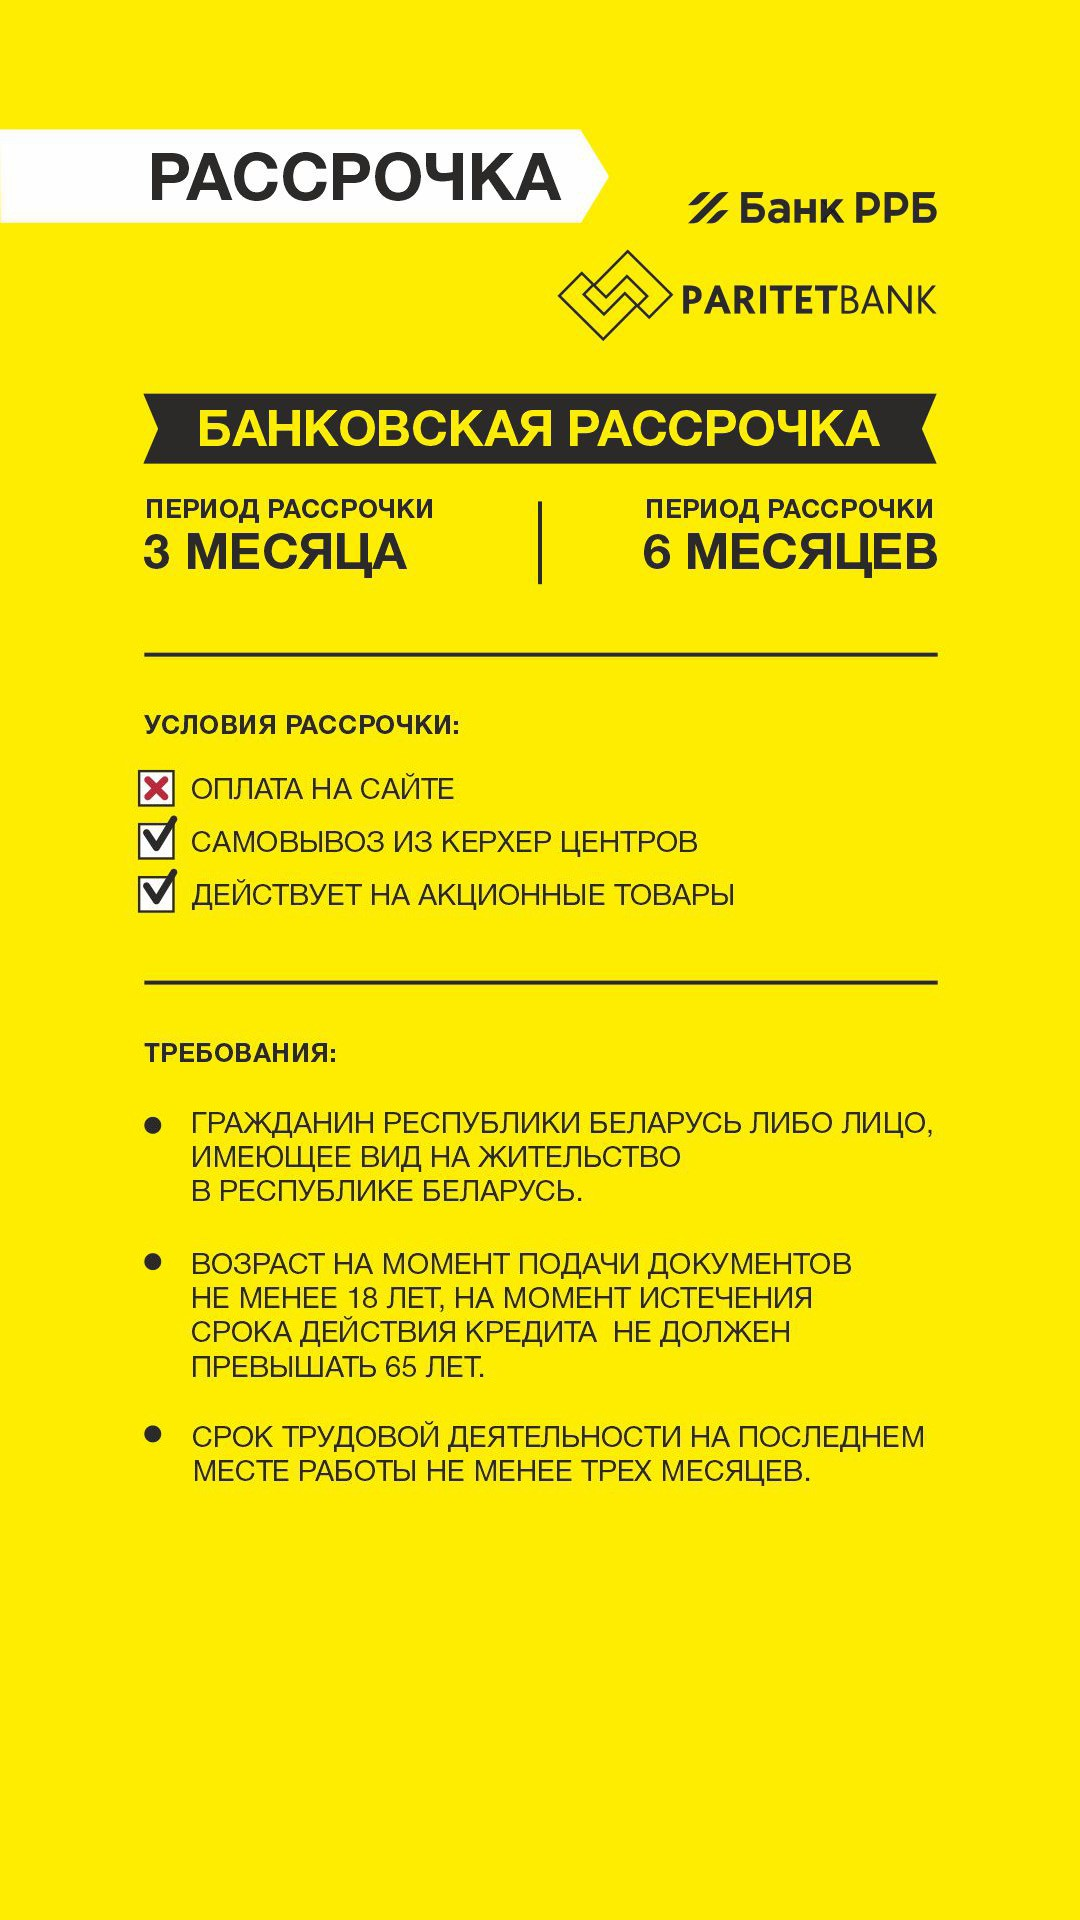 Karcher_highlight_rassrochka_1080x1920_4-1